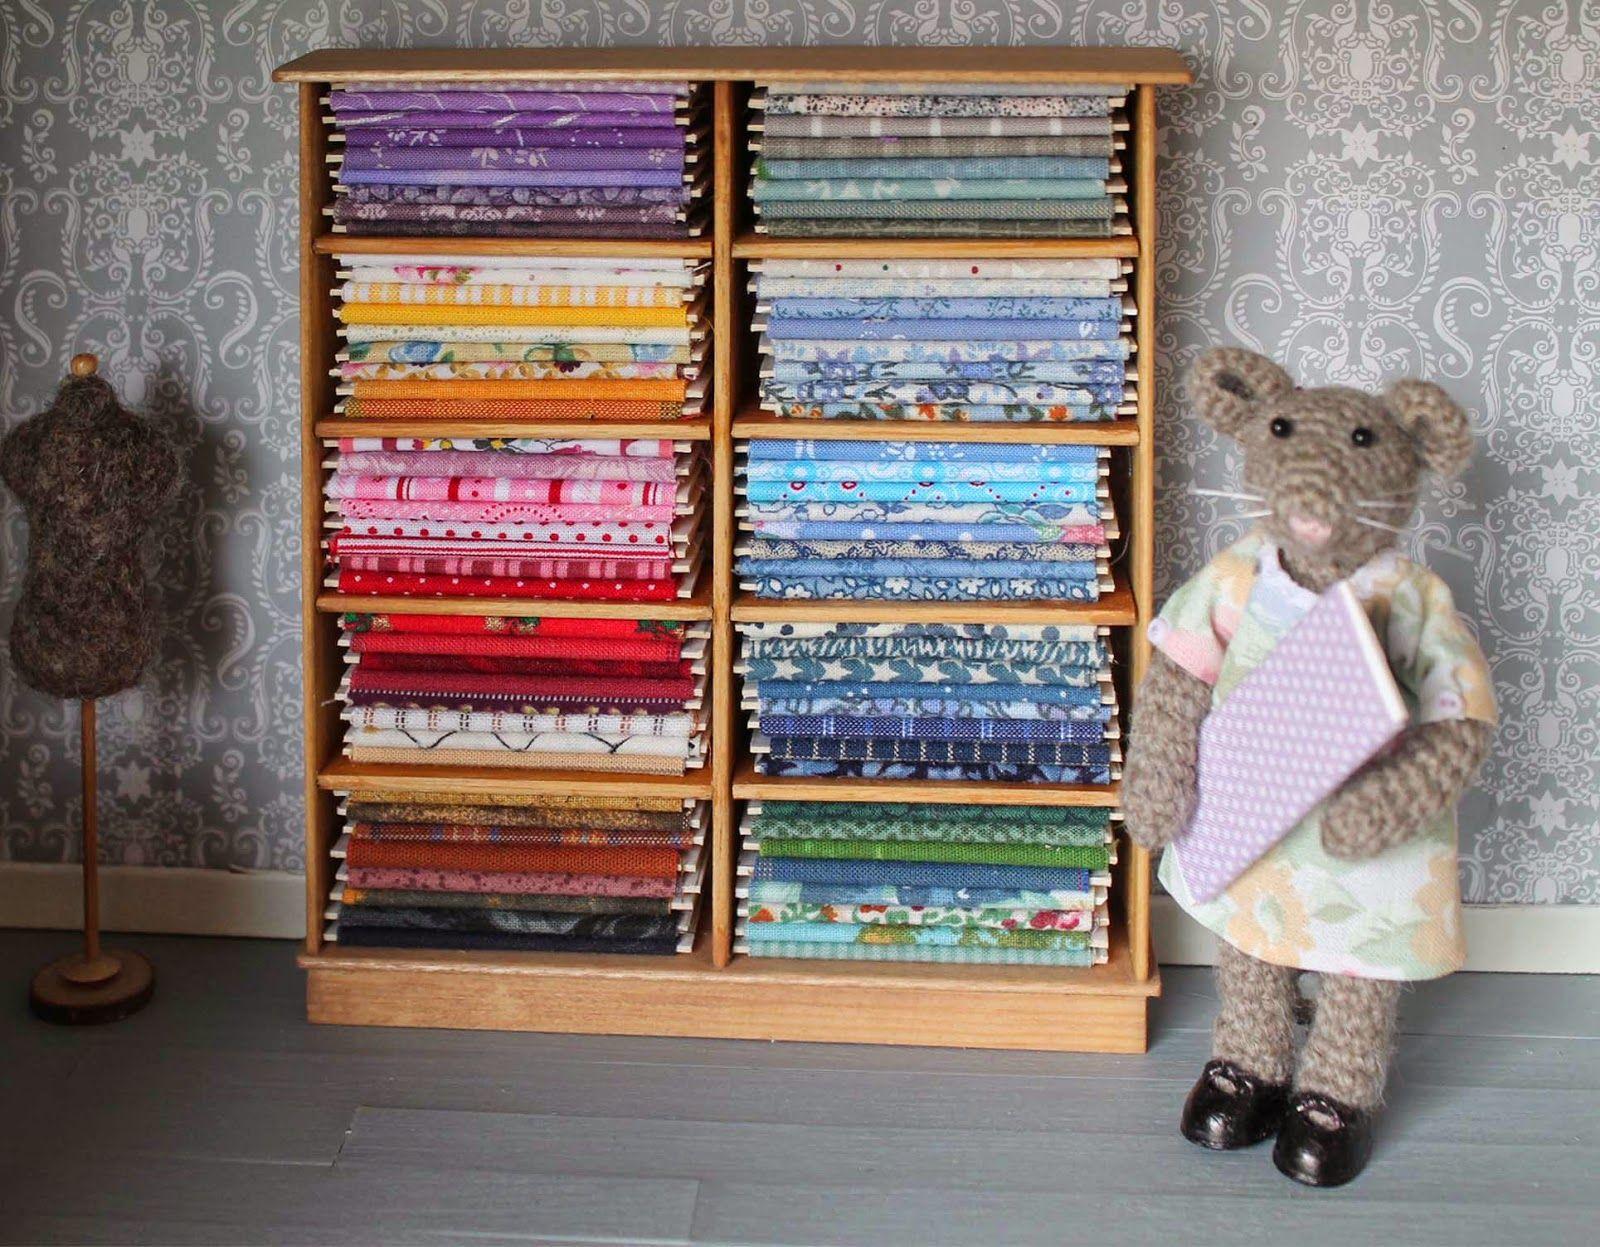 Colourful bolts of fabrics